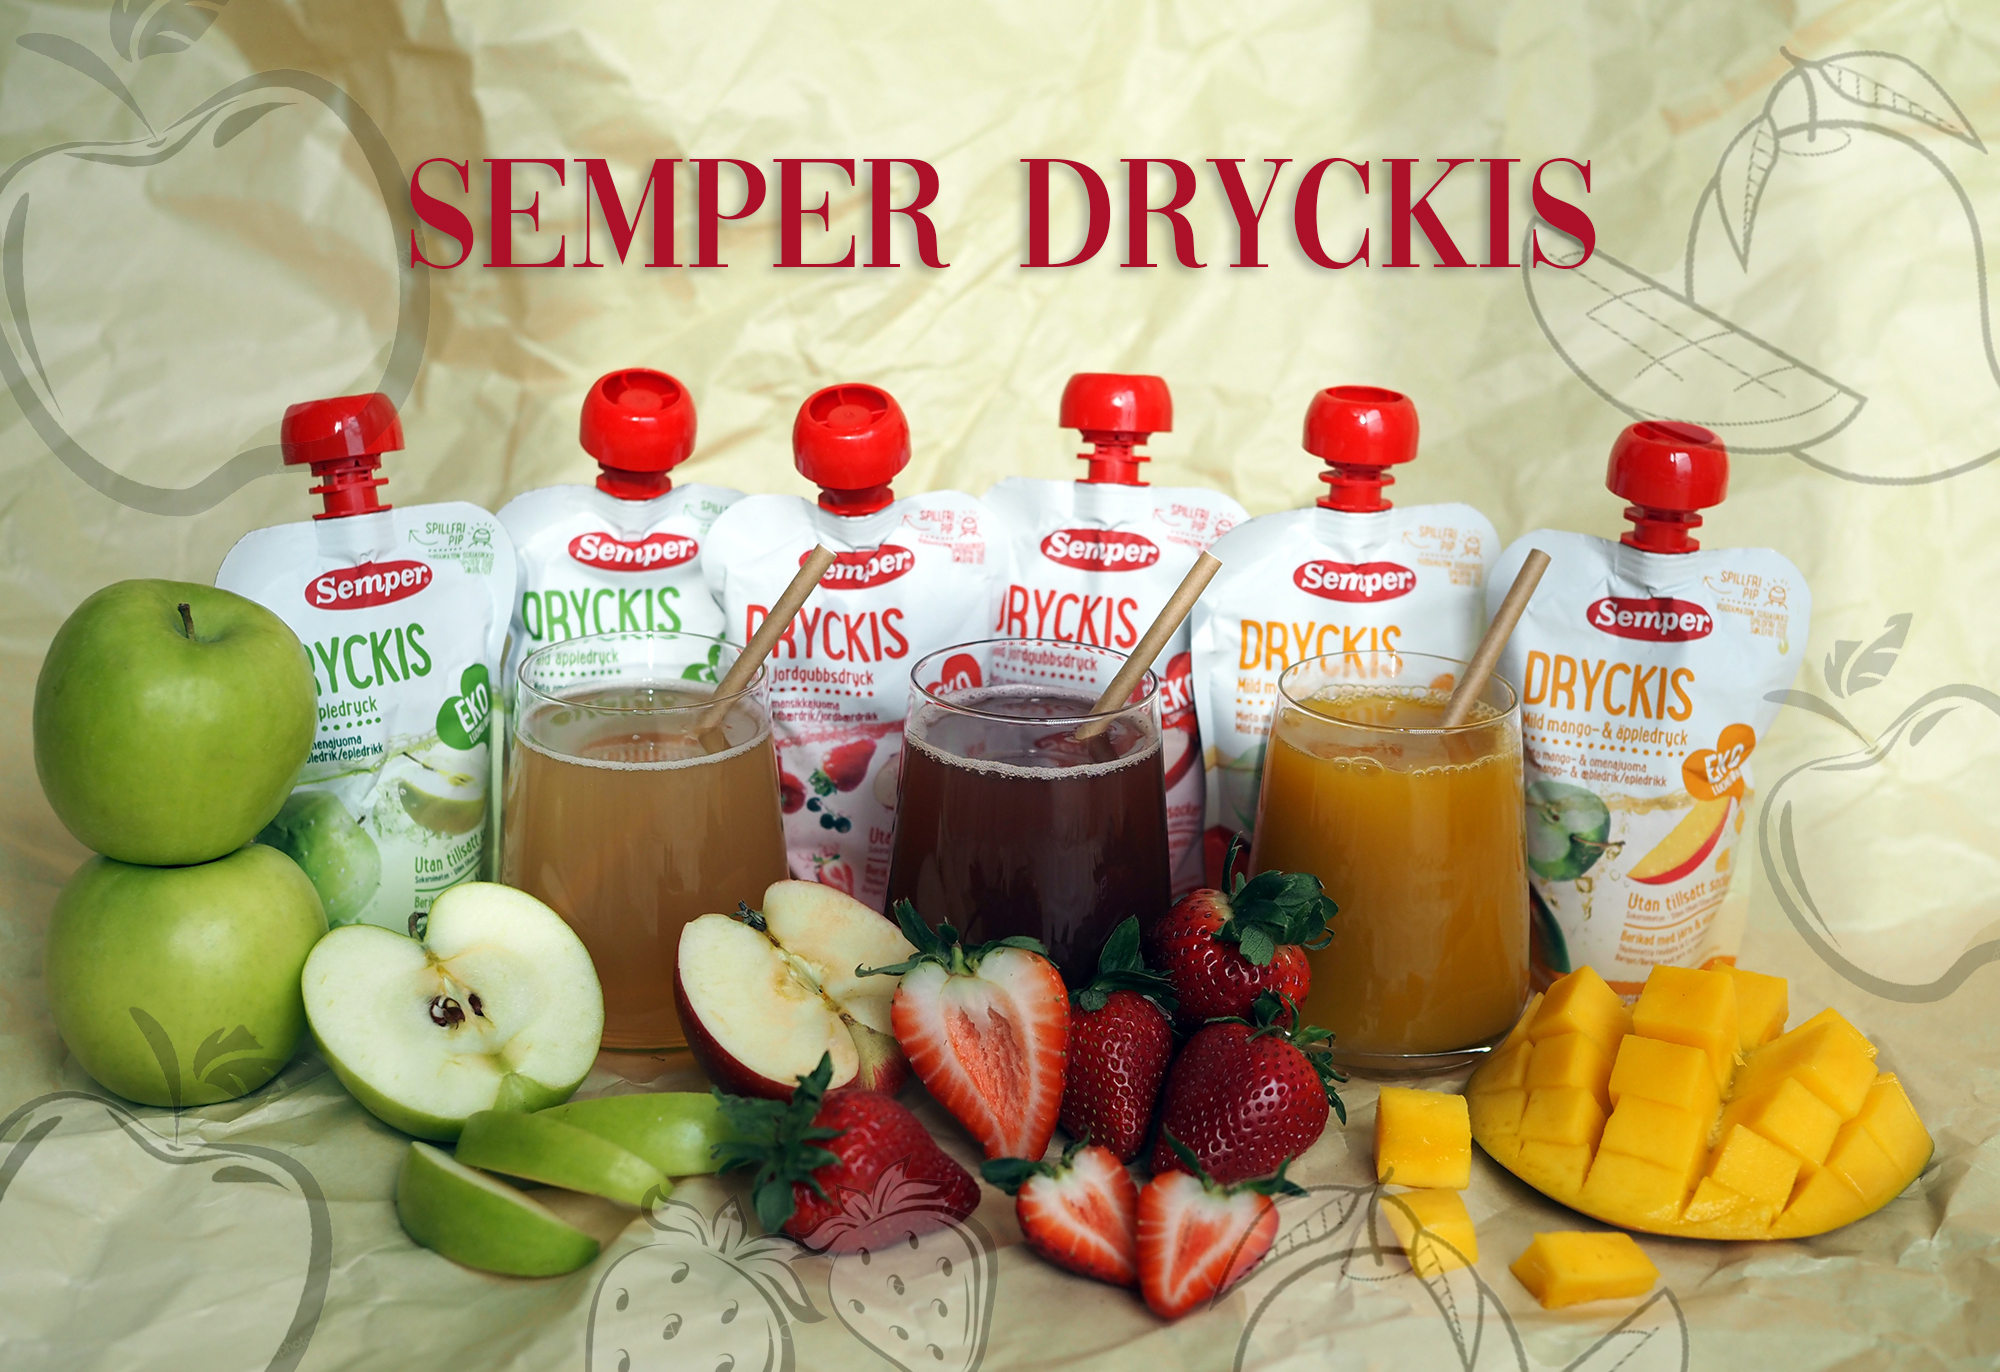 Semper Dryckis